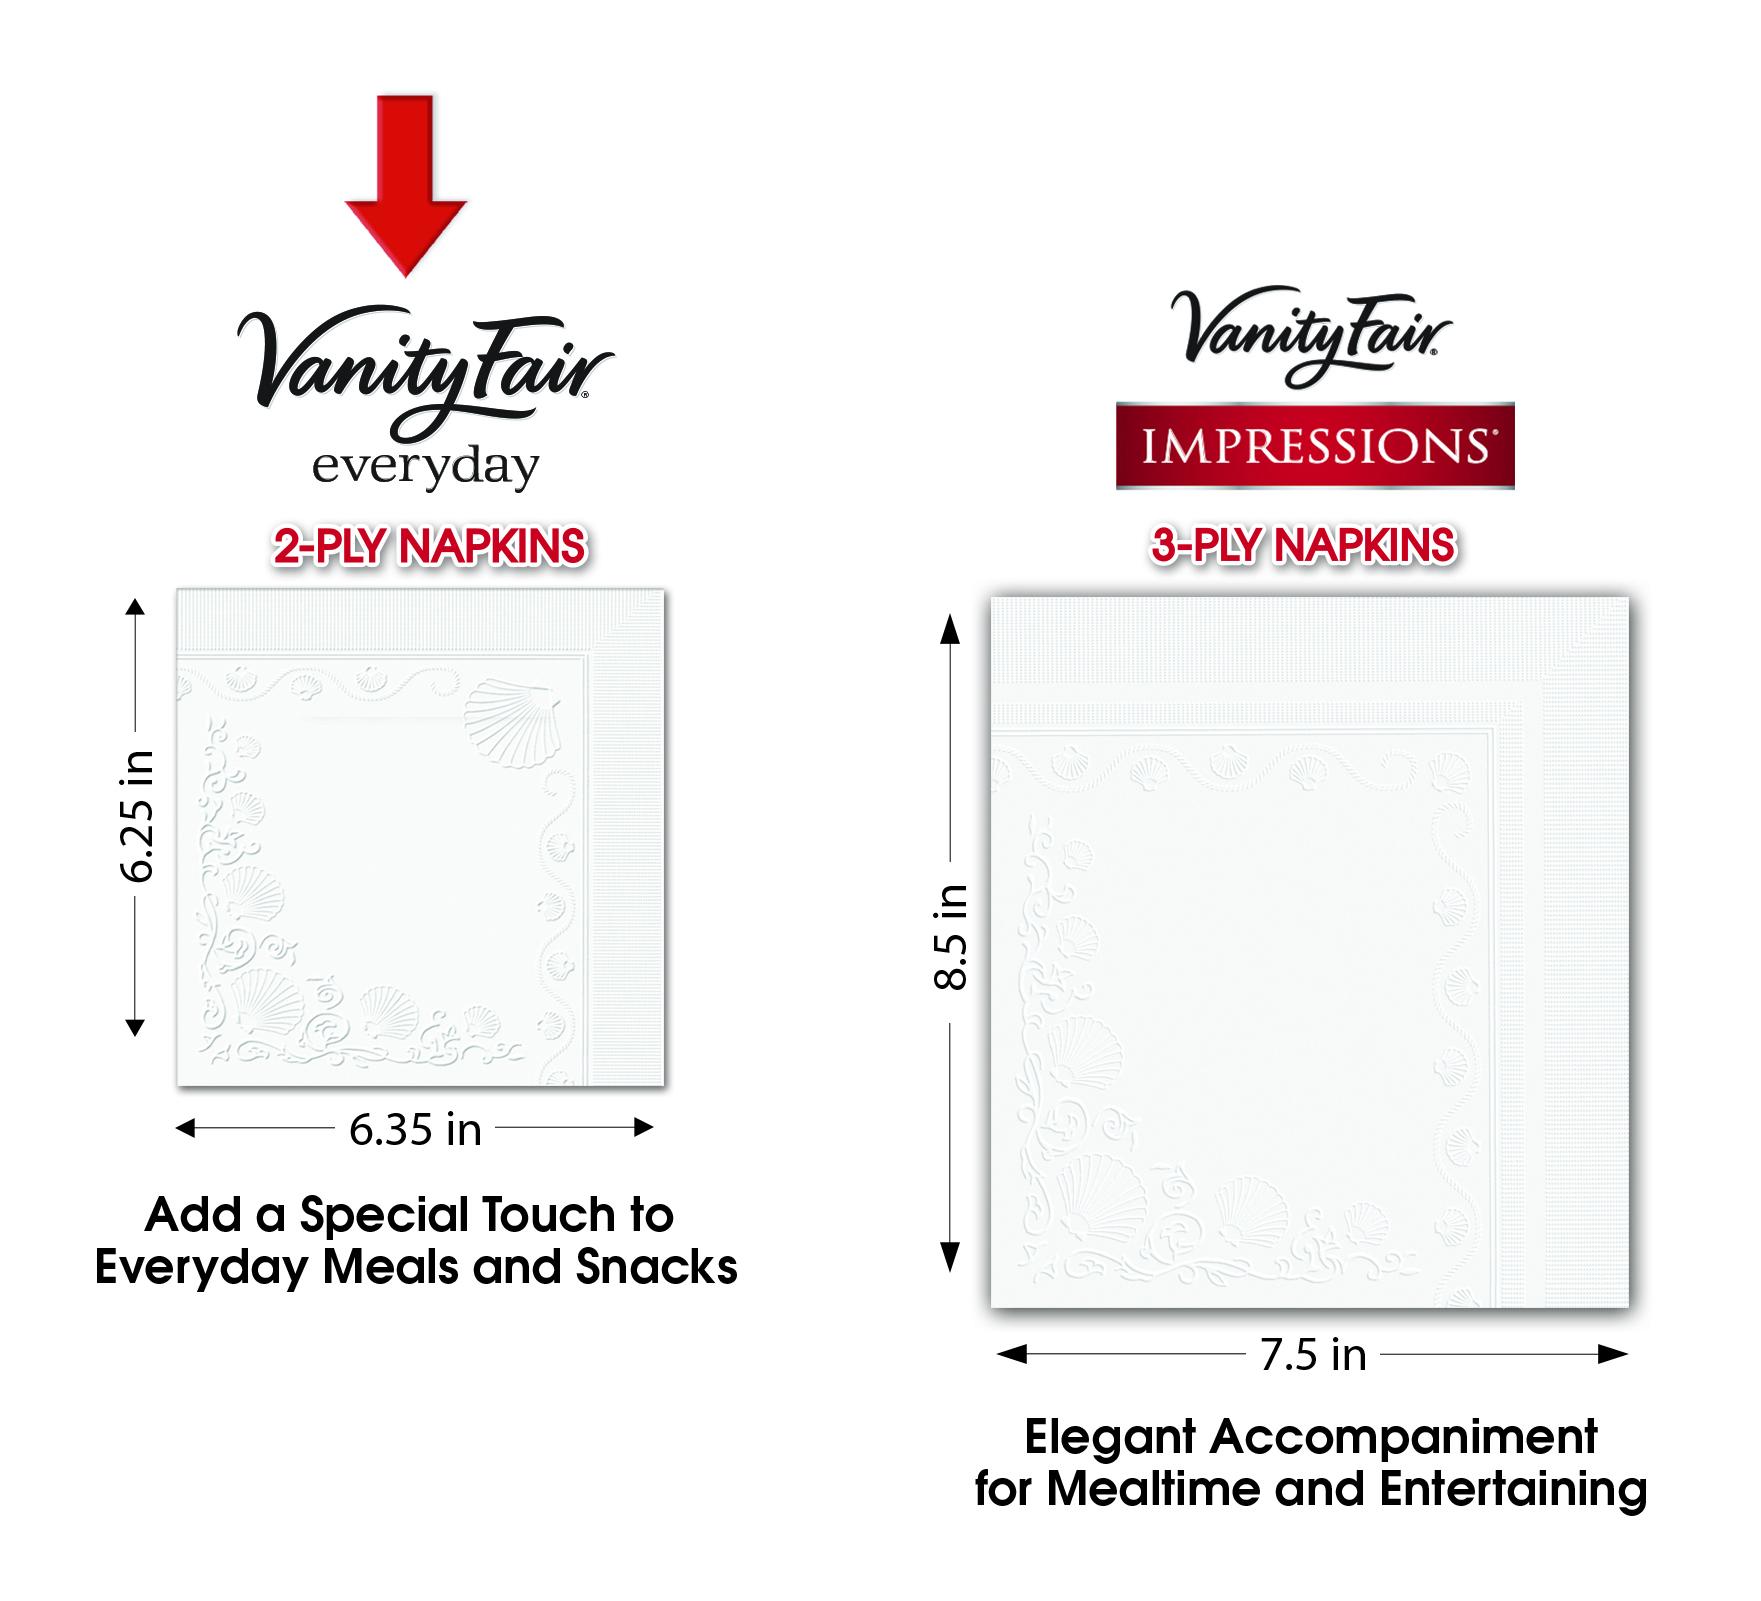 Vanity Fair Everyday Napkins, 300 count - Walmart.com